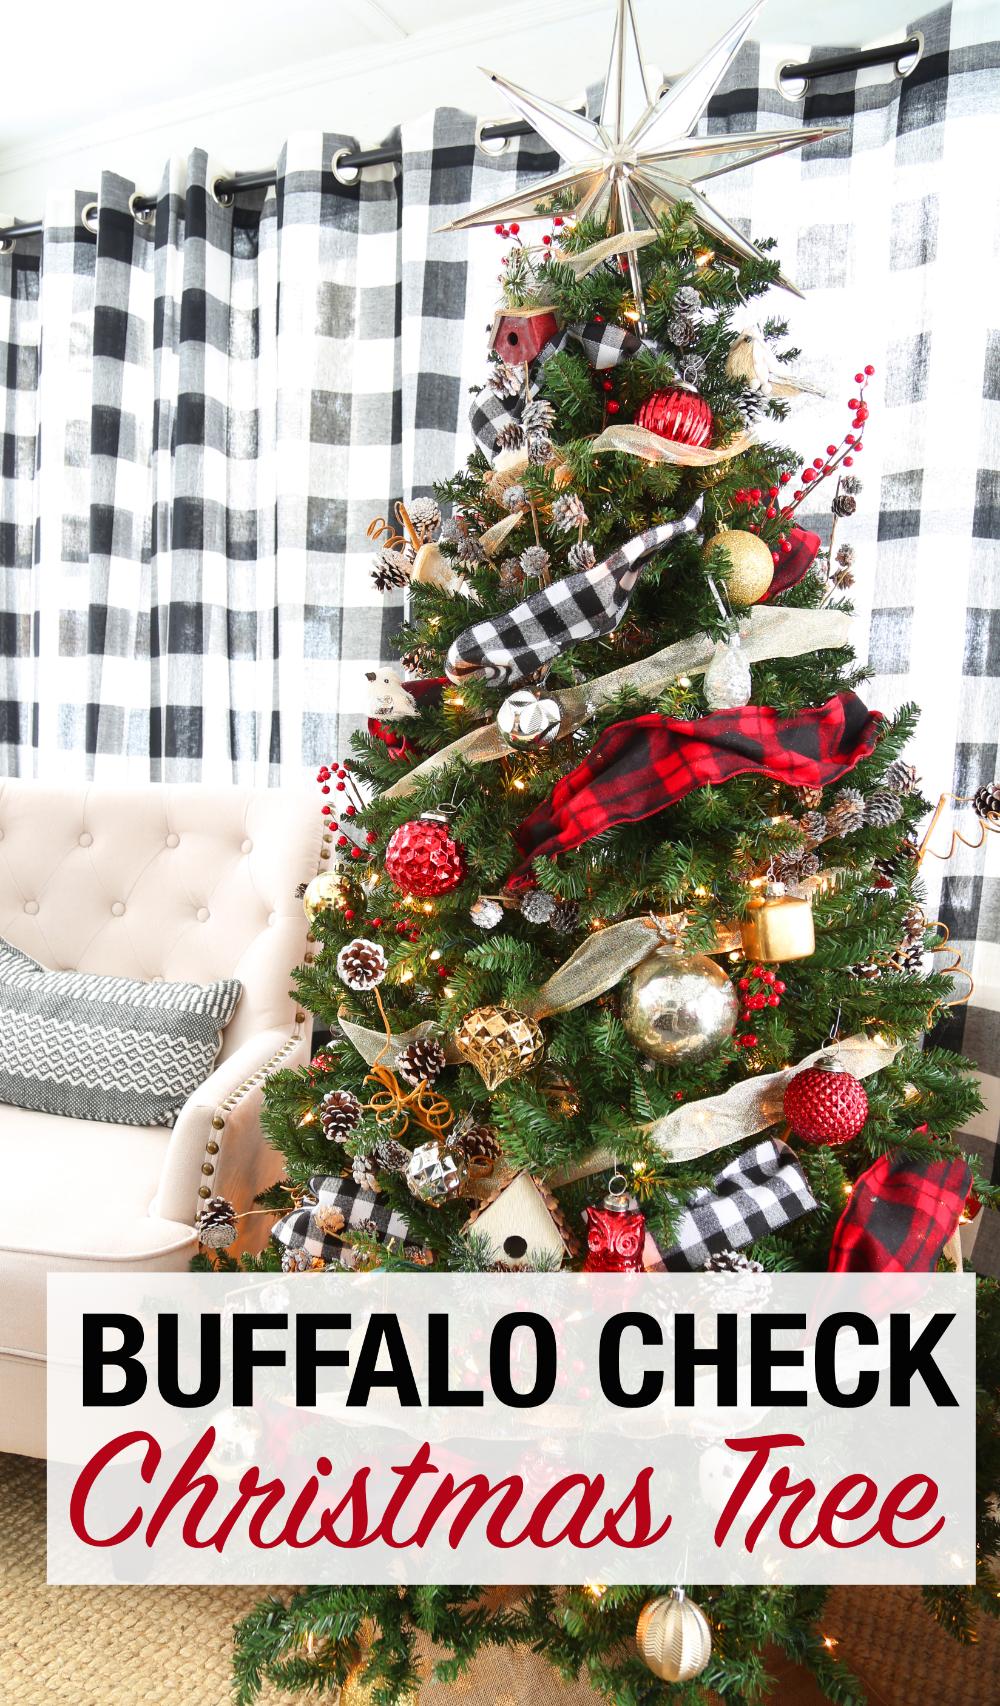 A buffalo check plaid Christmas tree decorate with black and white buffalo check and red and black plaid ribbon. #ChristmasTree #BuffaloCheck #ChristmasDecor #SeasonalDecor